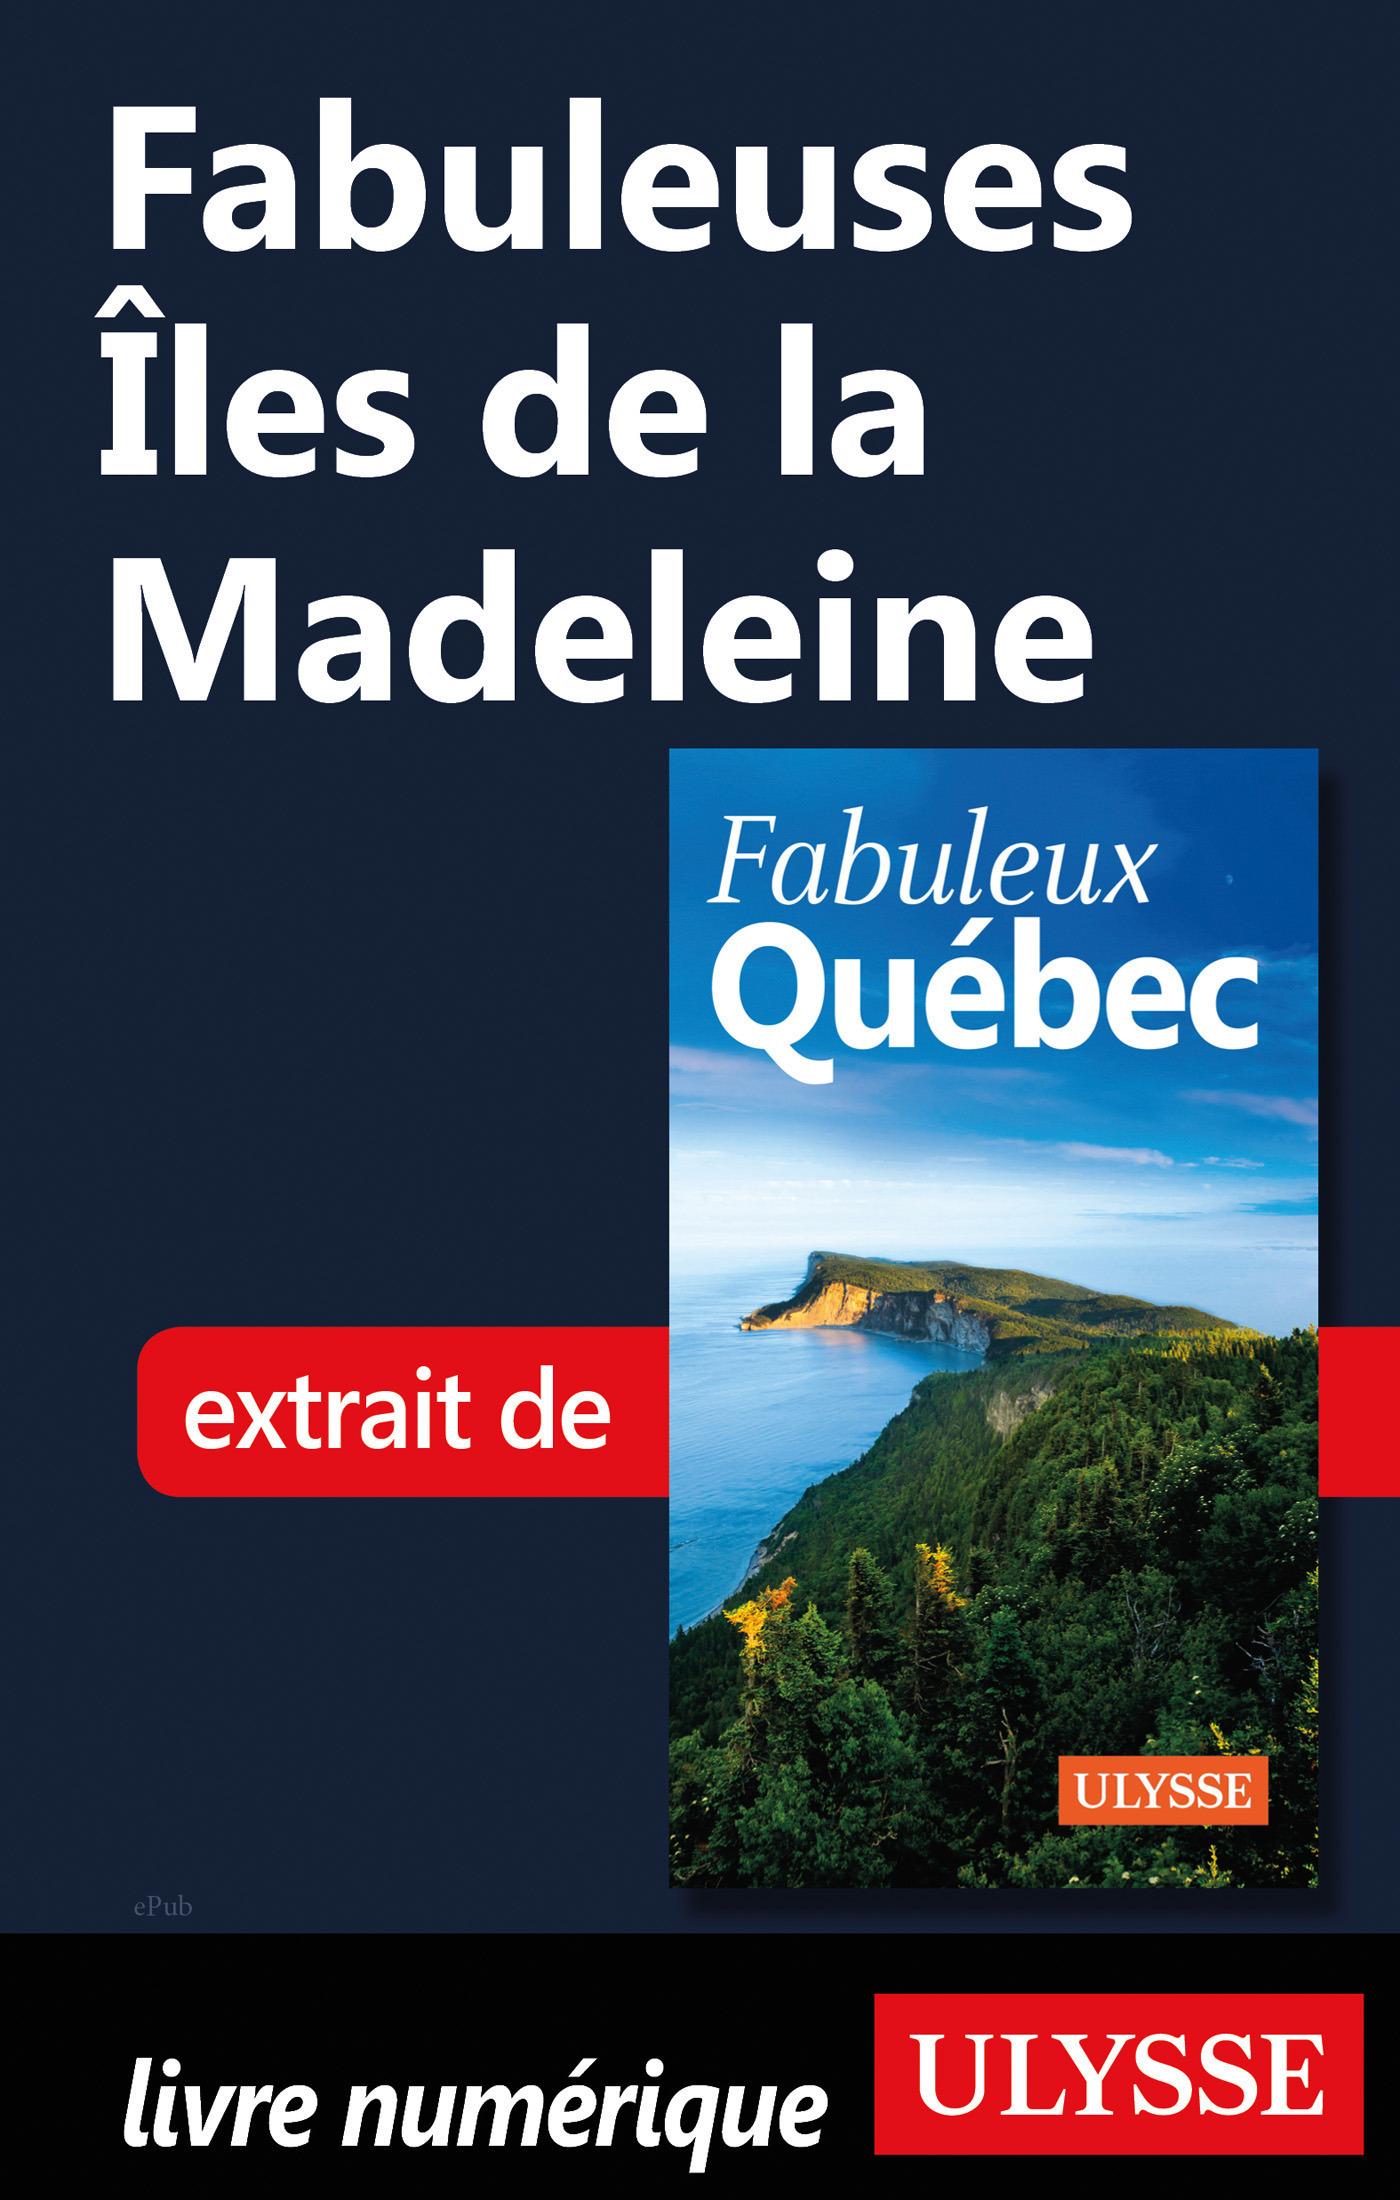 Fabuleuses Iles de la Madeleine